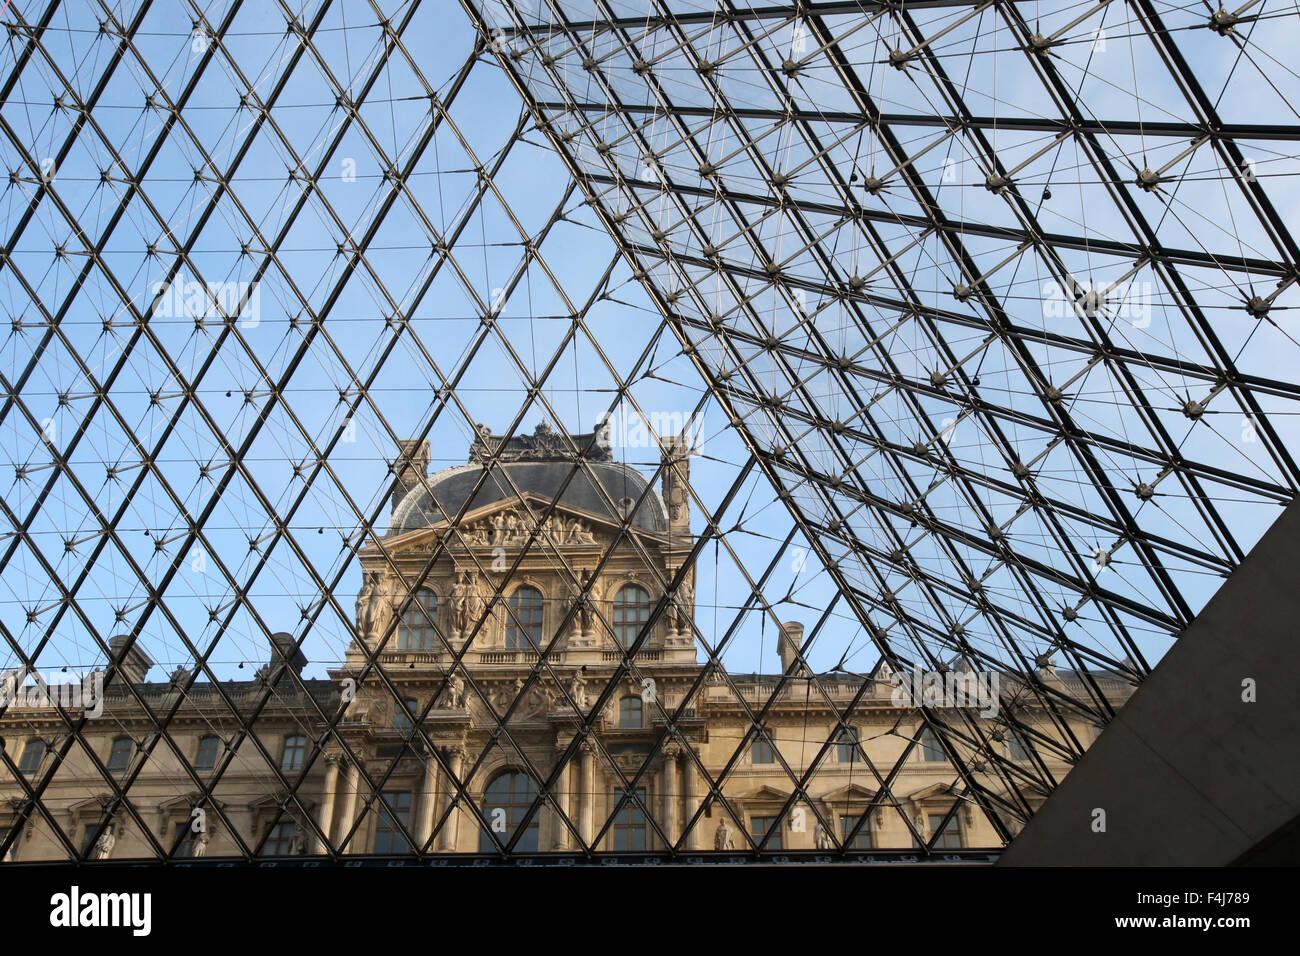 Palais du Louvre seen through the Pyramid, Paris, France, Europe - Stock Image